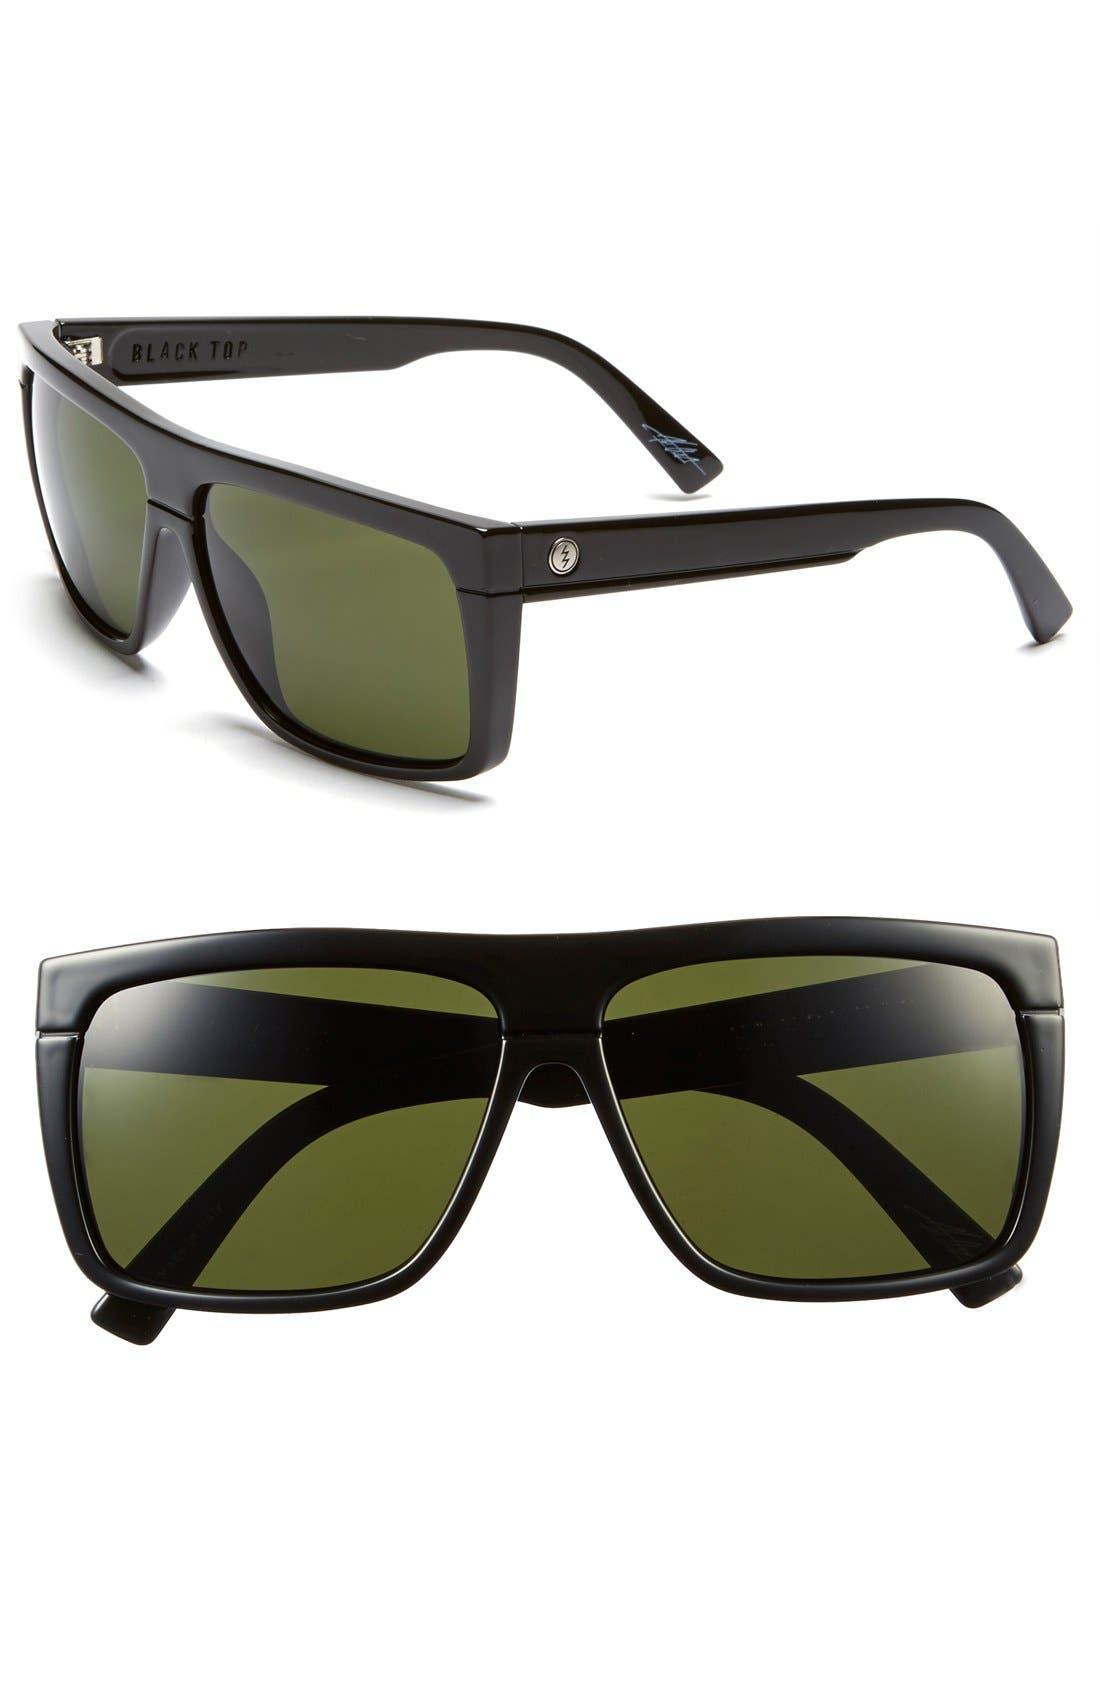 Main Image - ELECTRIC 'Black Top' 61mm Flat Top Sunglasses